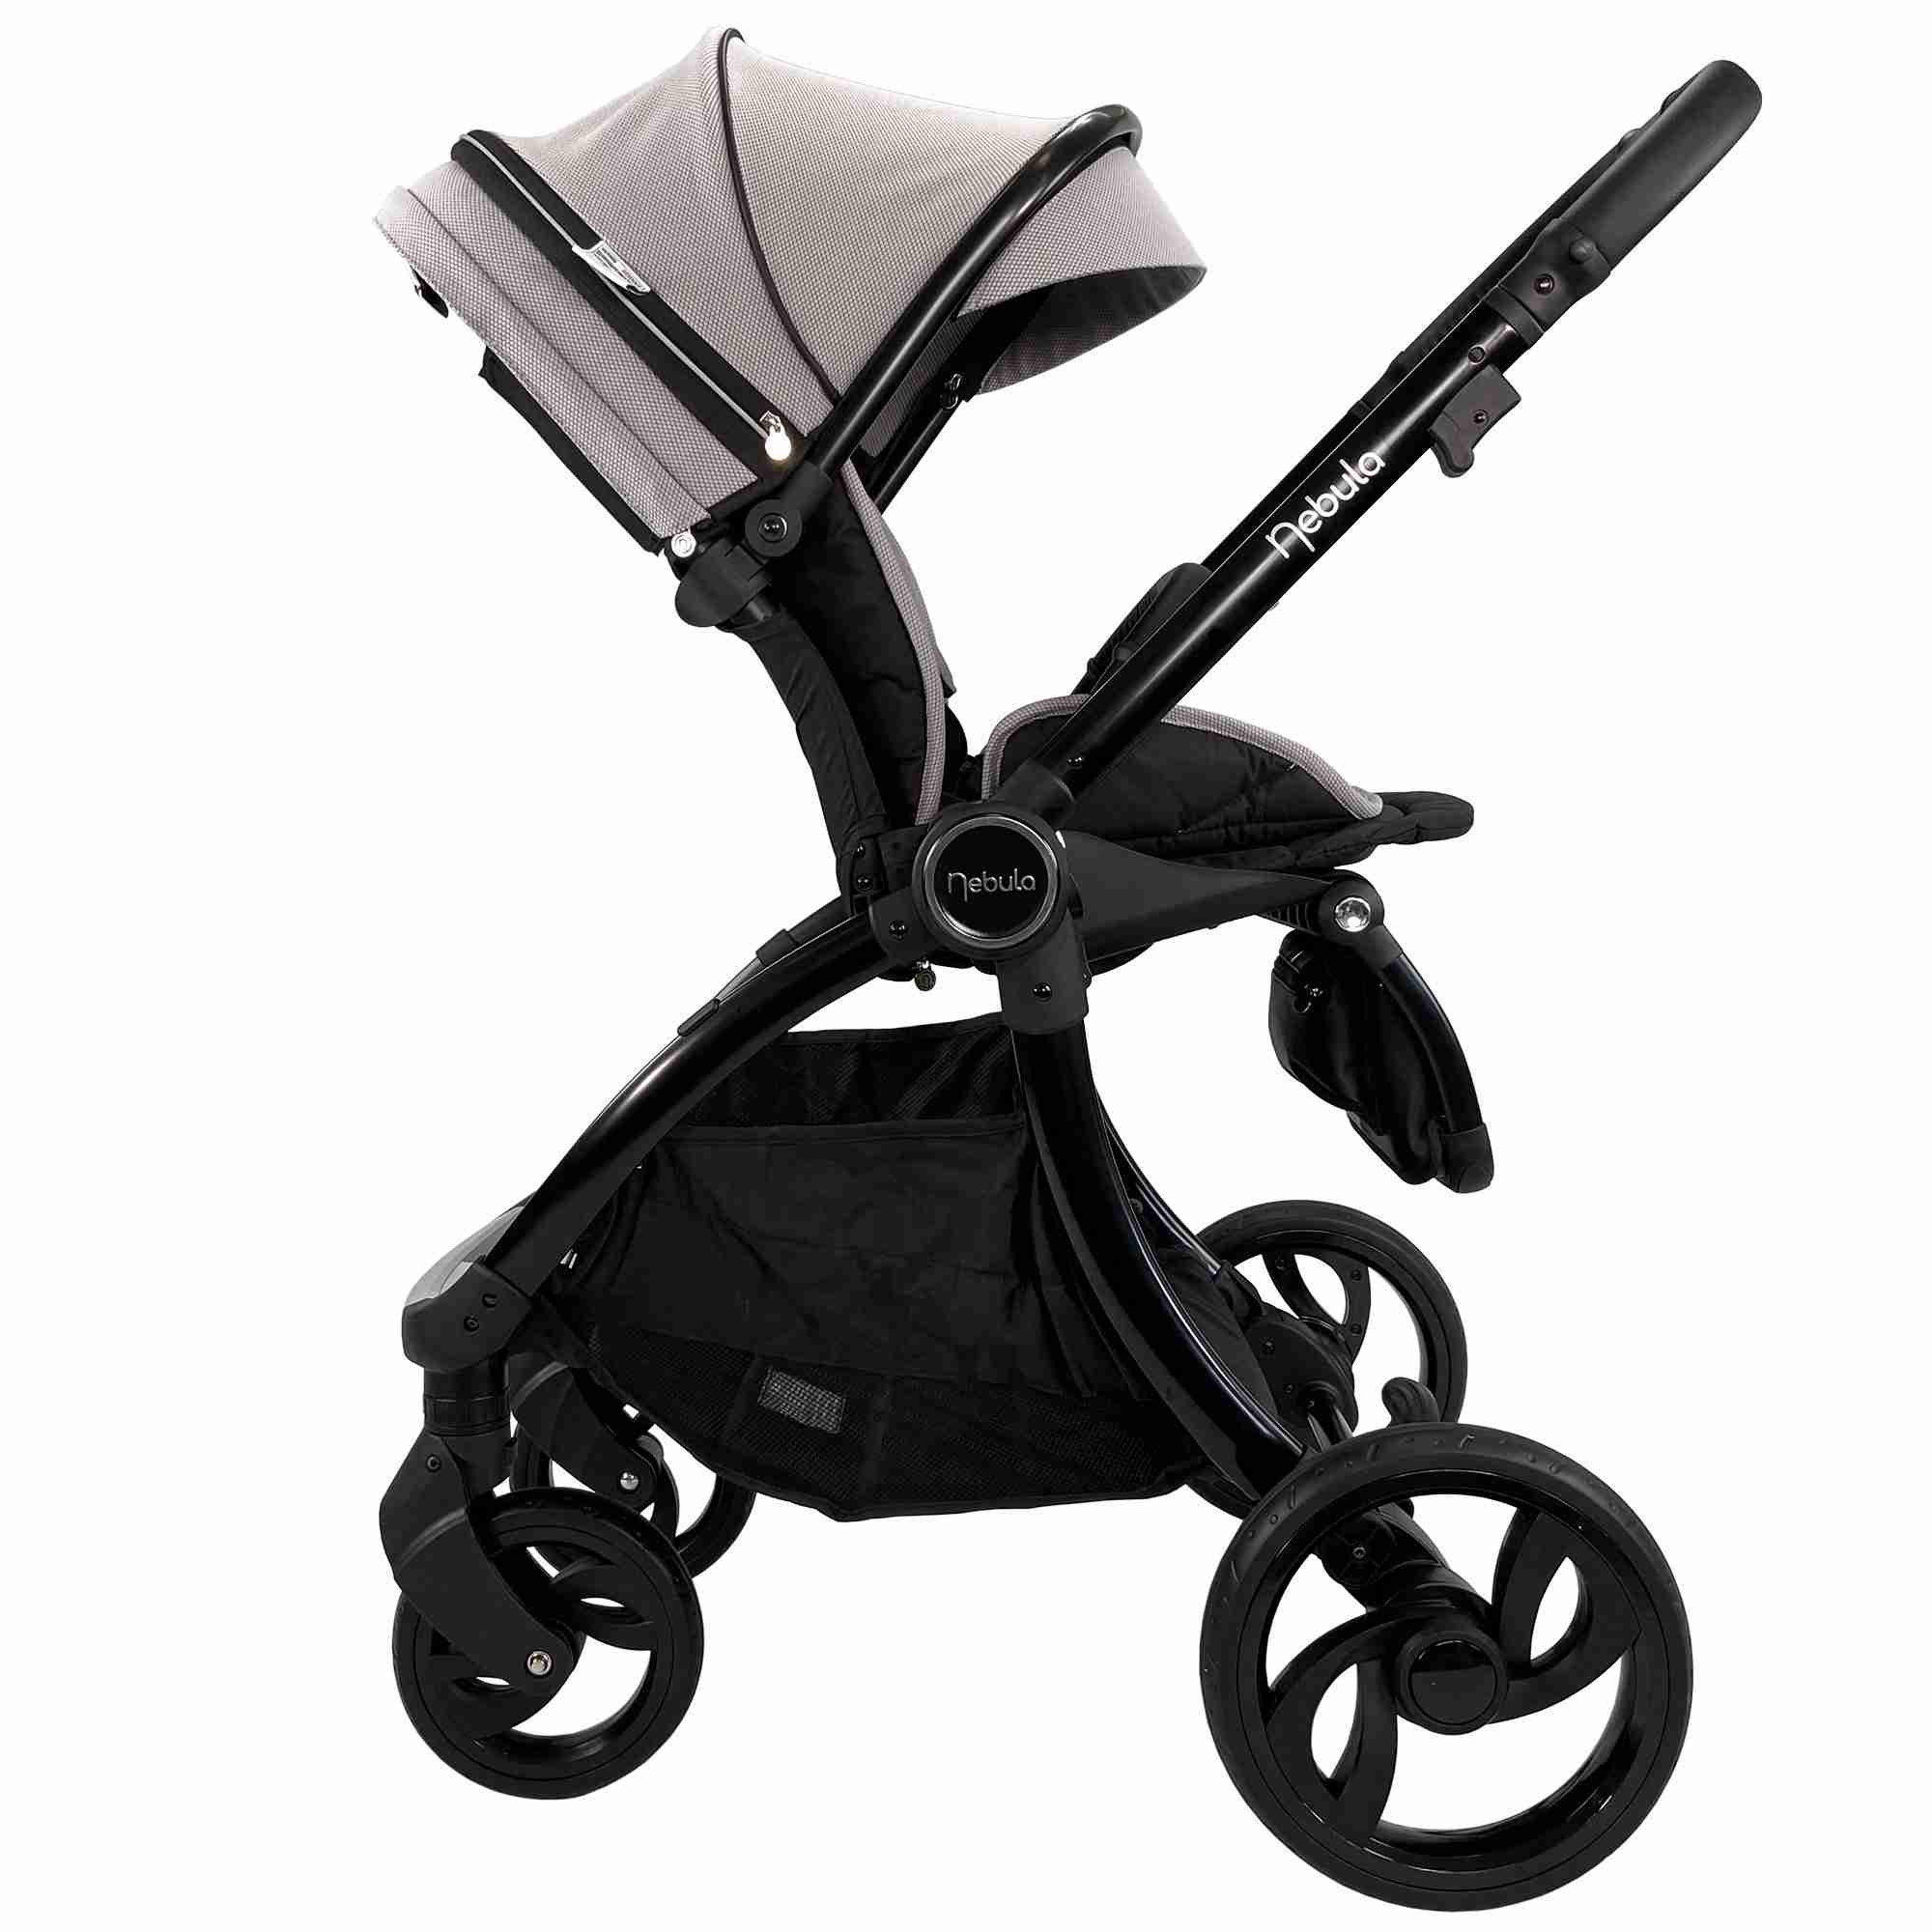 Venture Nebula stroller in Cool Grey side view